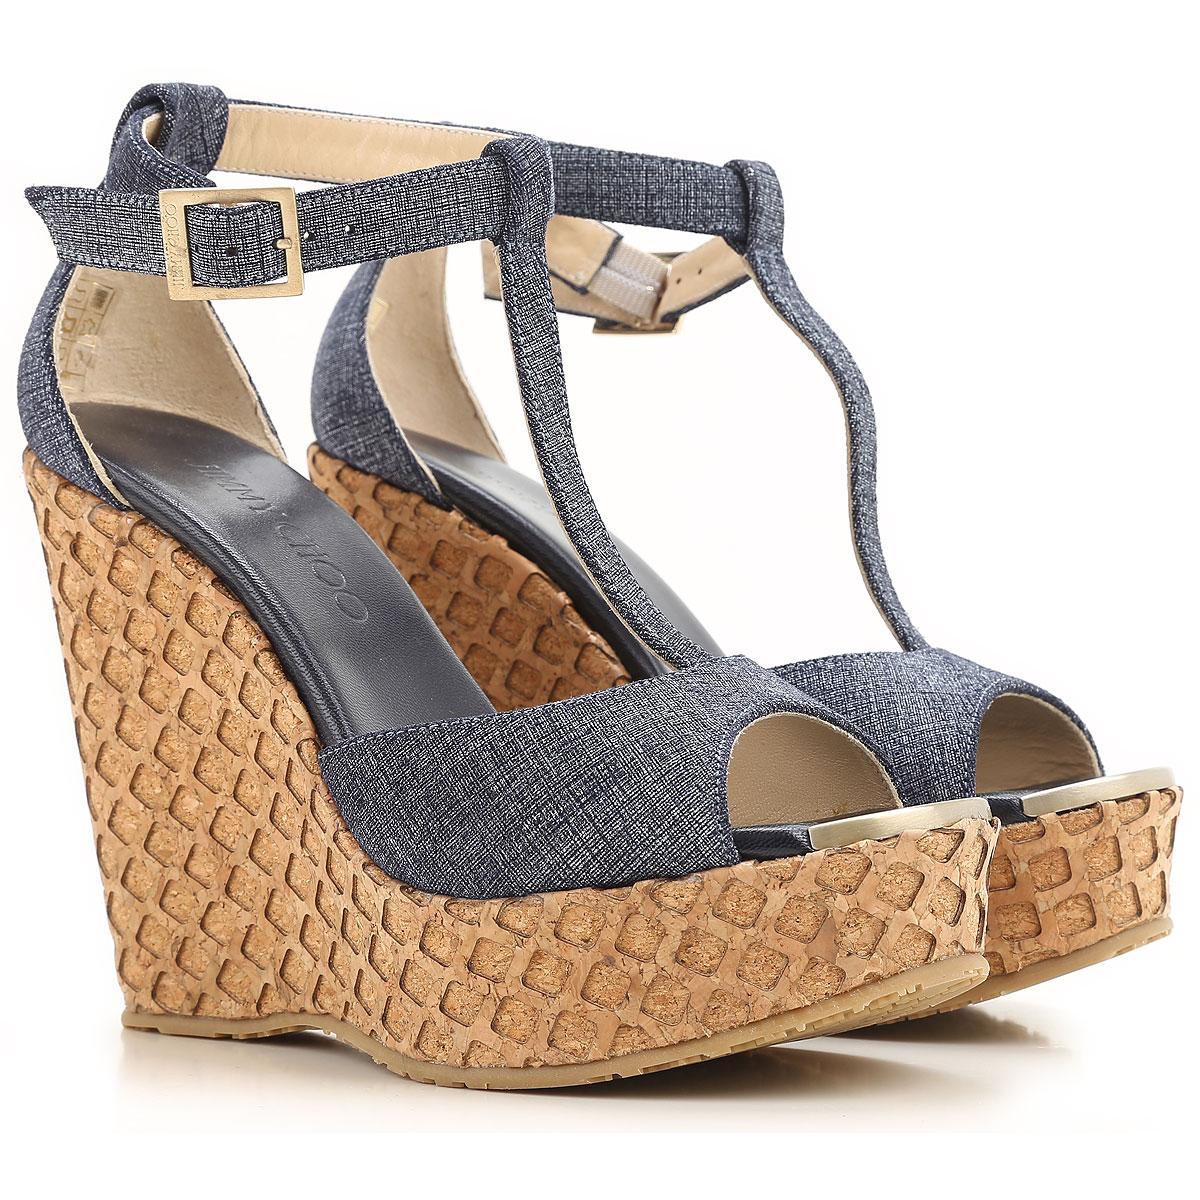 chaussures femme jimmy choo code produit pela dcw 161. Black Bedroom Furniture Sets. Home Design Ideas